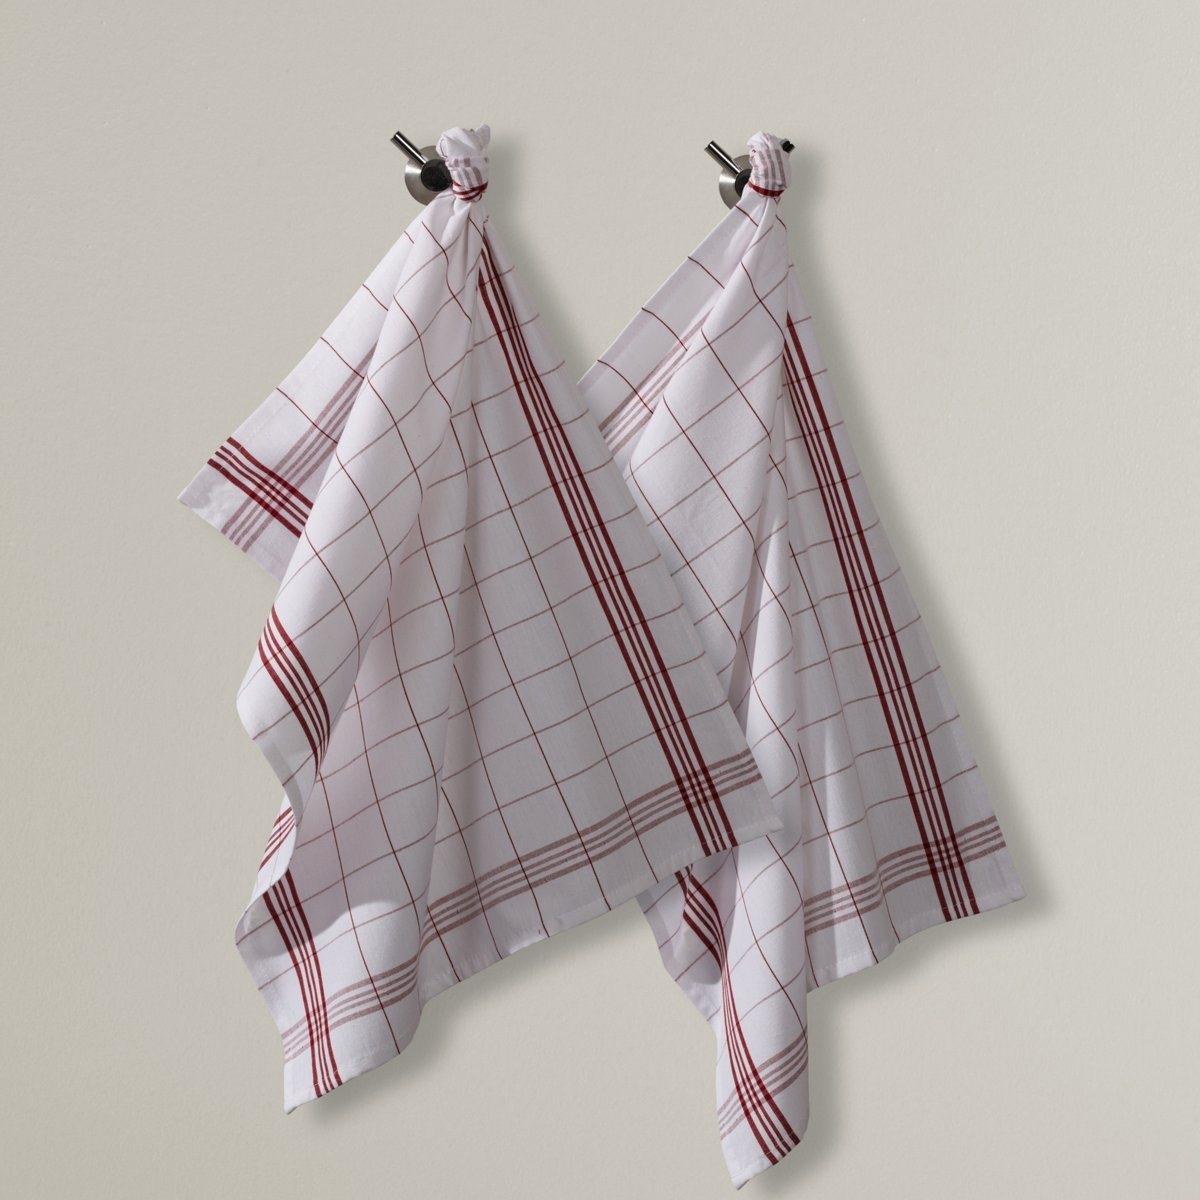 2 полотенца кухонных от La Redoute